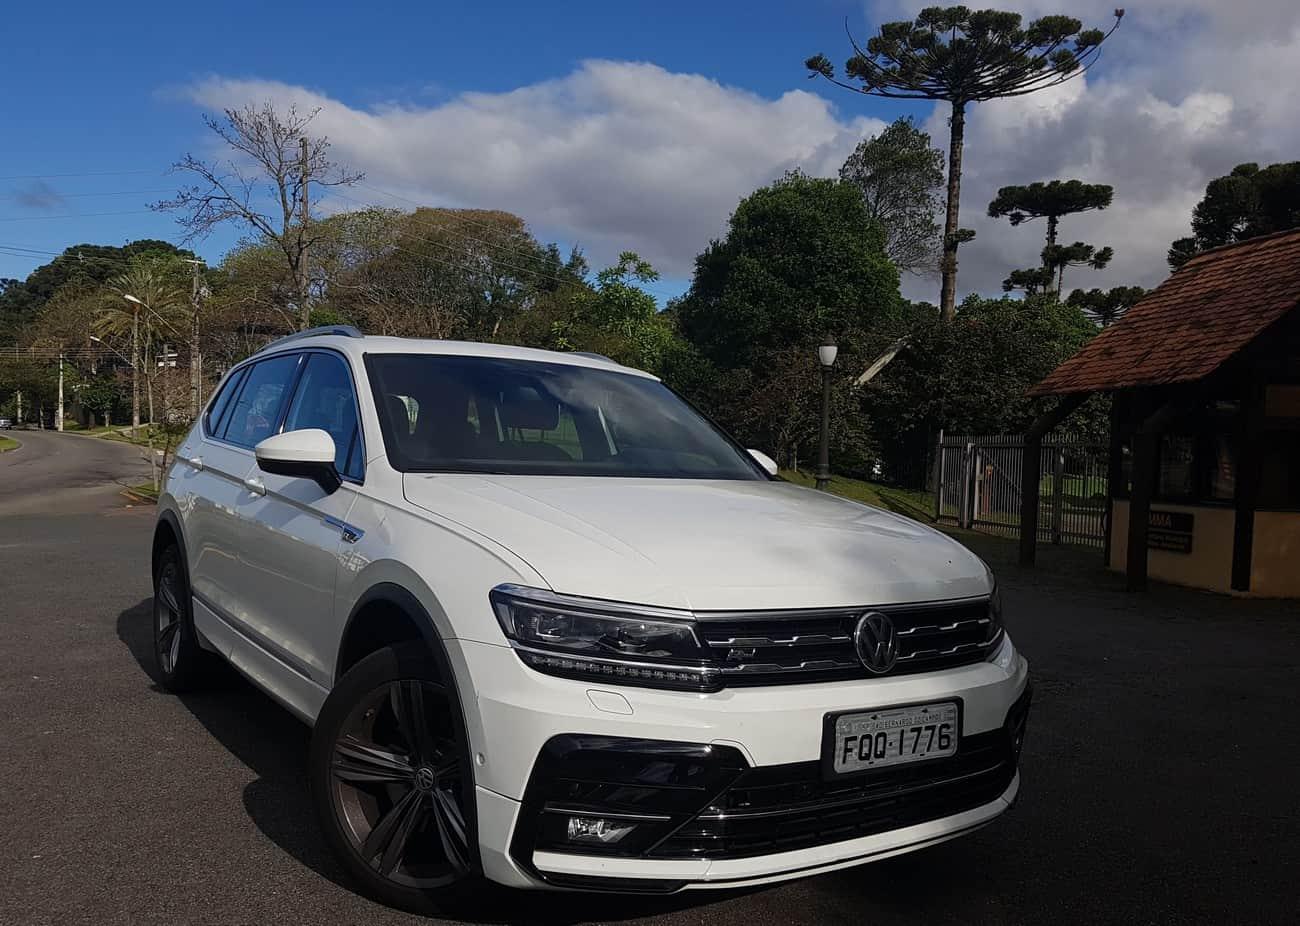 Volkswagen sobe preços de carros e Tiguan já passa de R$ 200 mil